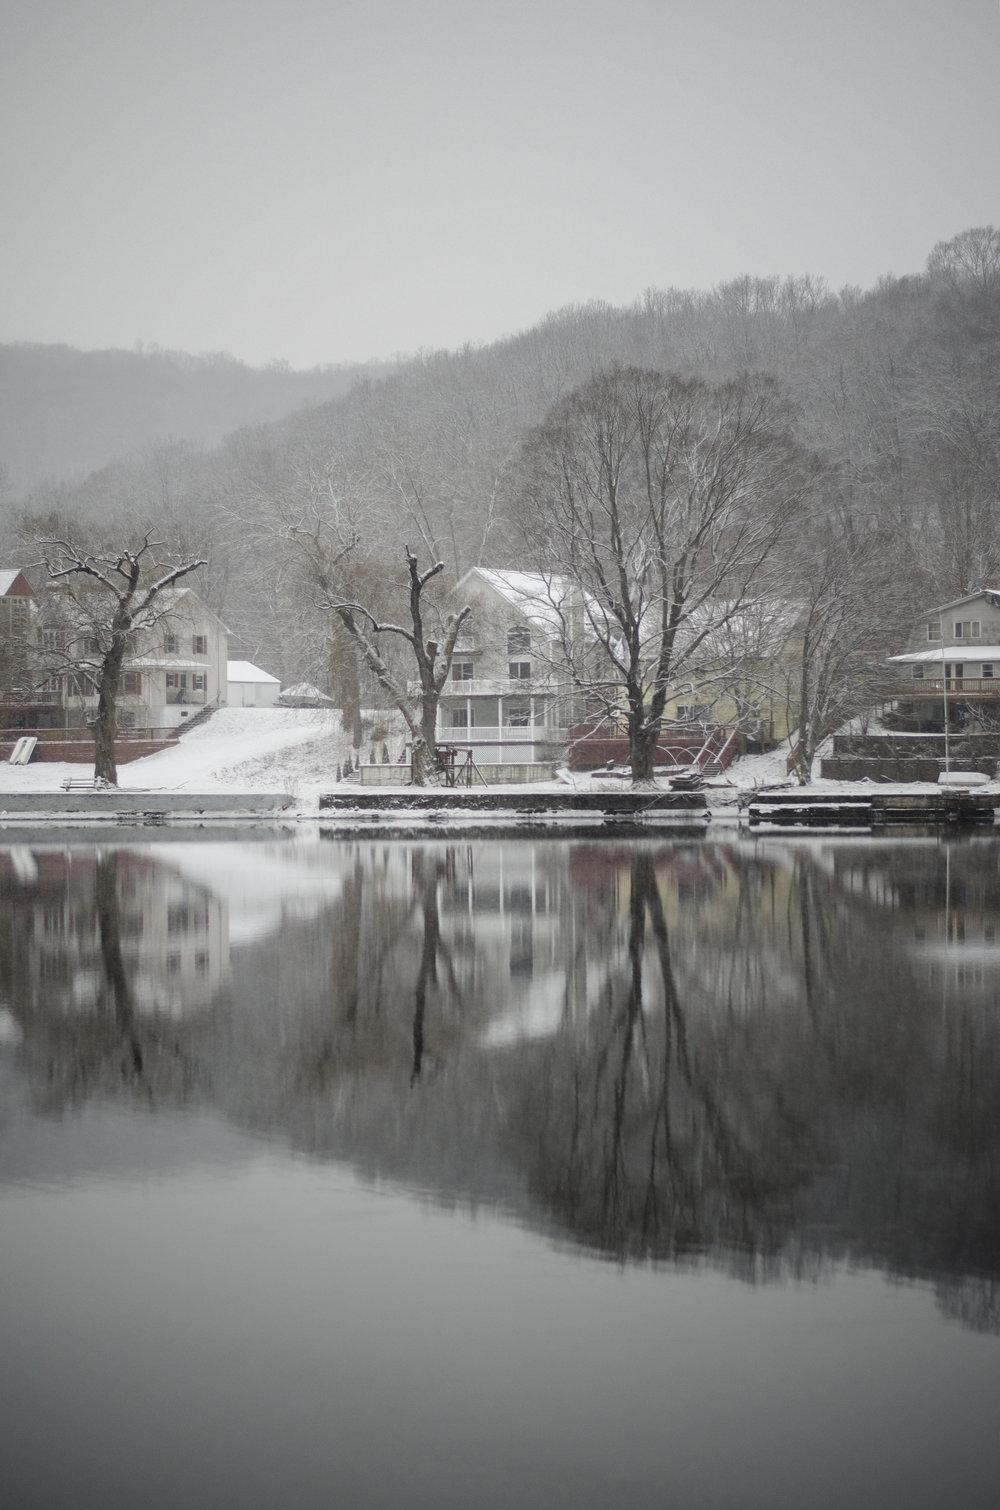 snowy-river-3_39463644231_o.jpg